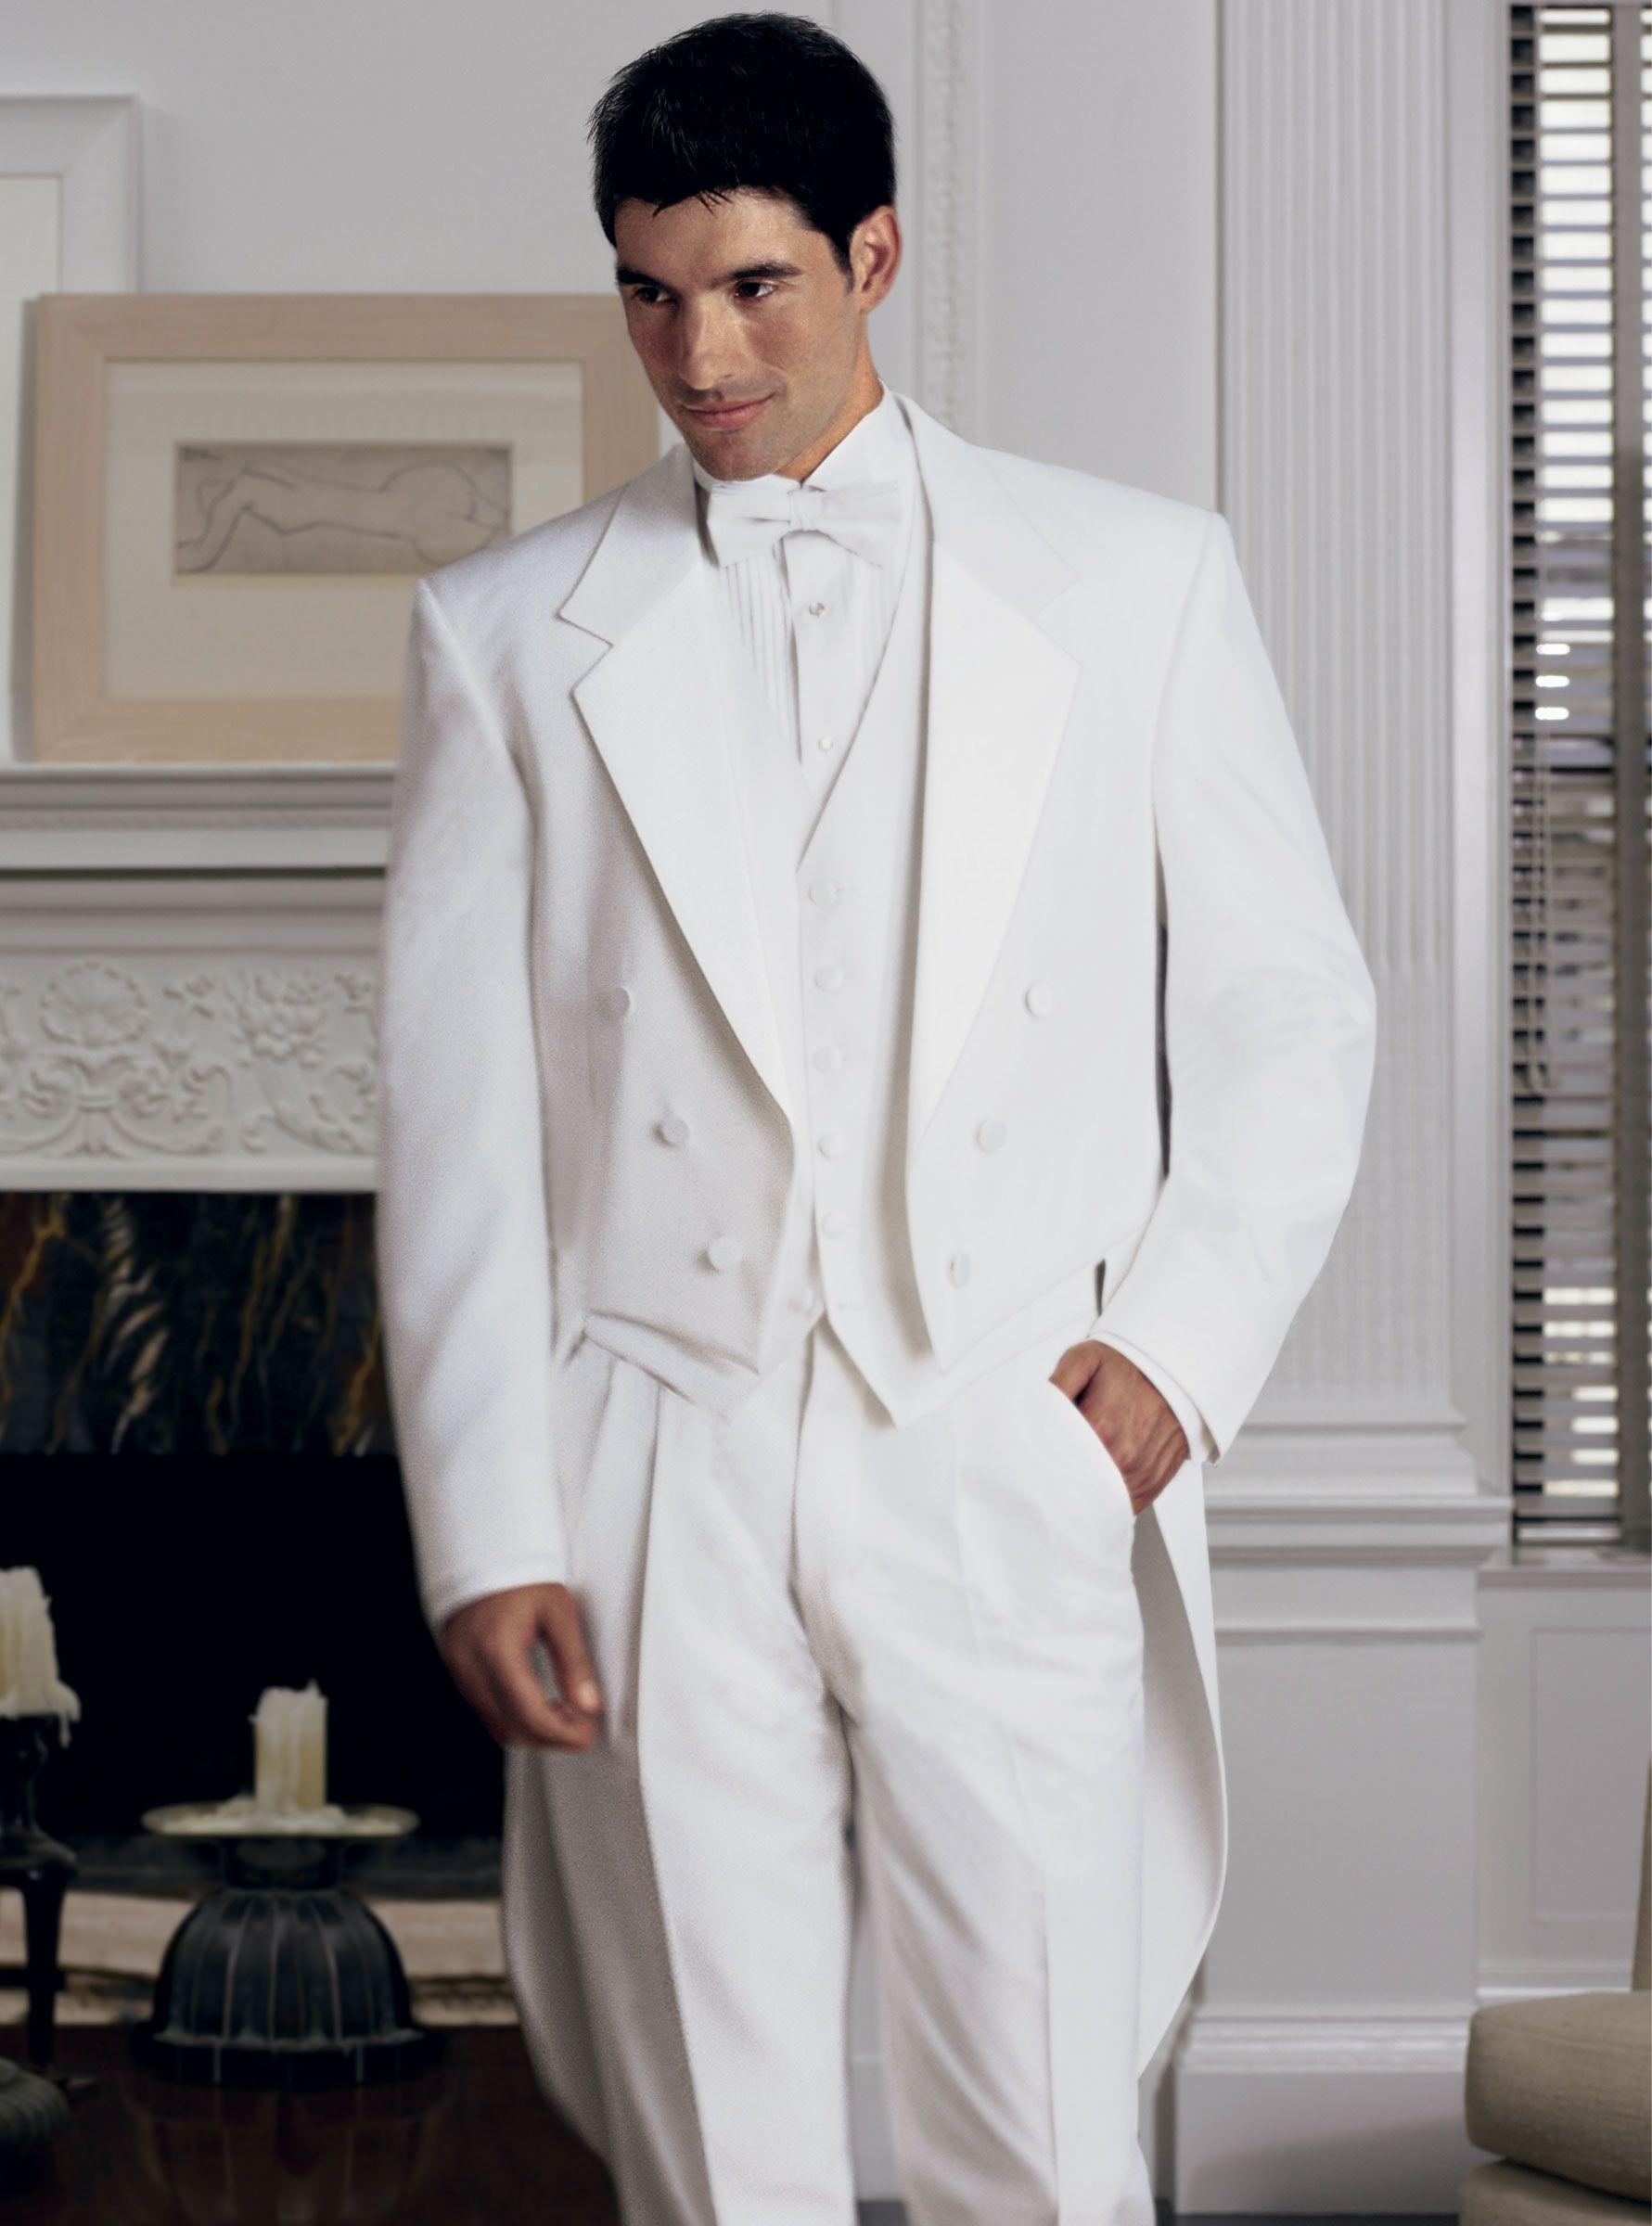 Groom Wear 2014 Wedding Suits Custom Made Suit for Men Three Piece ...